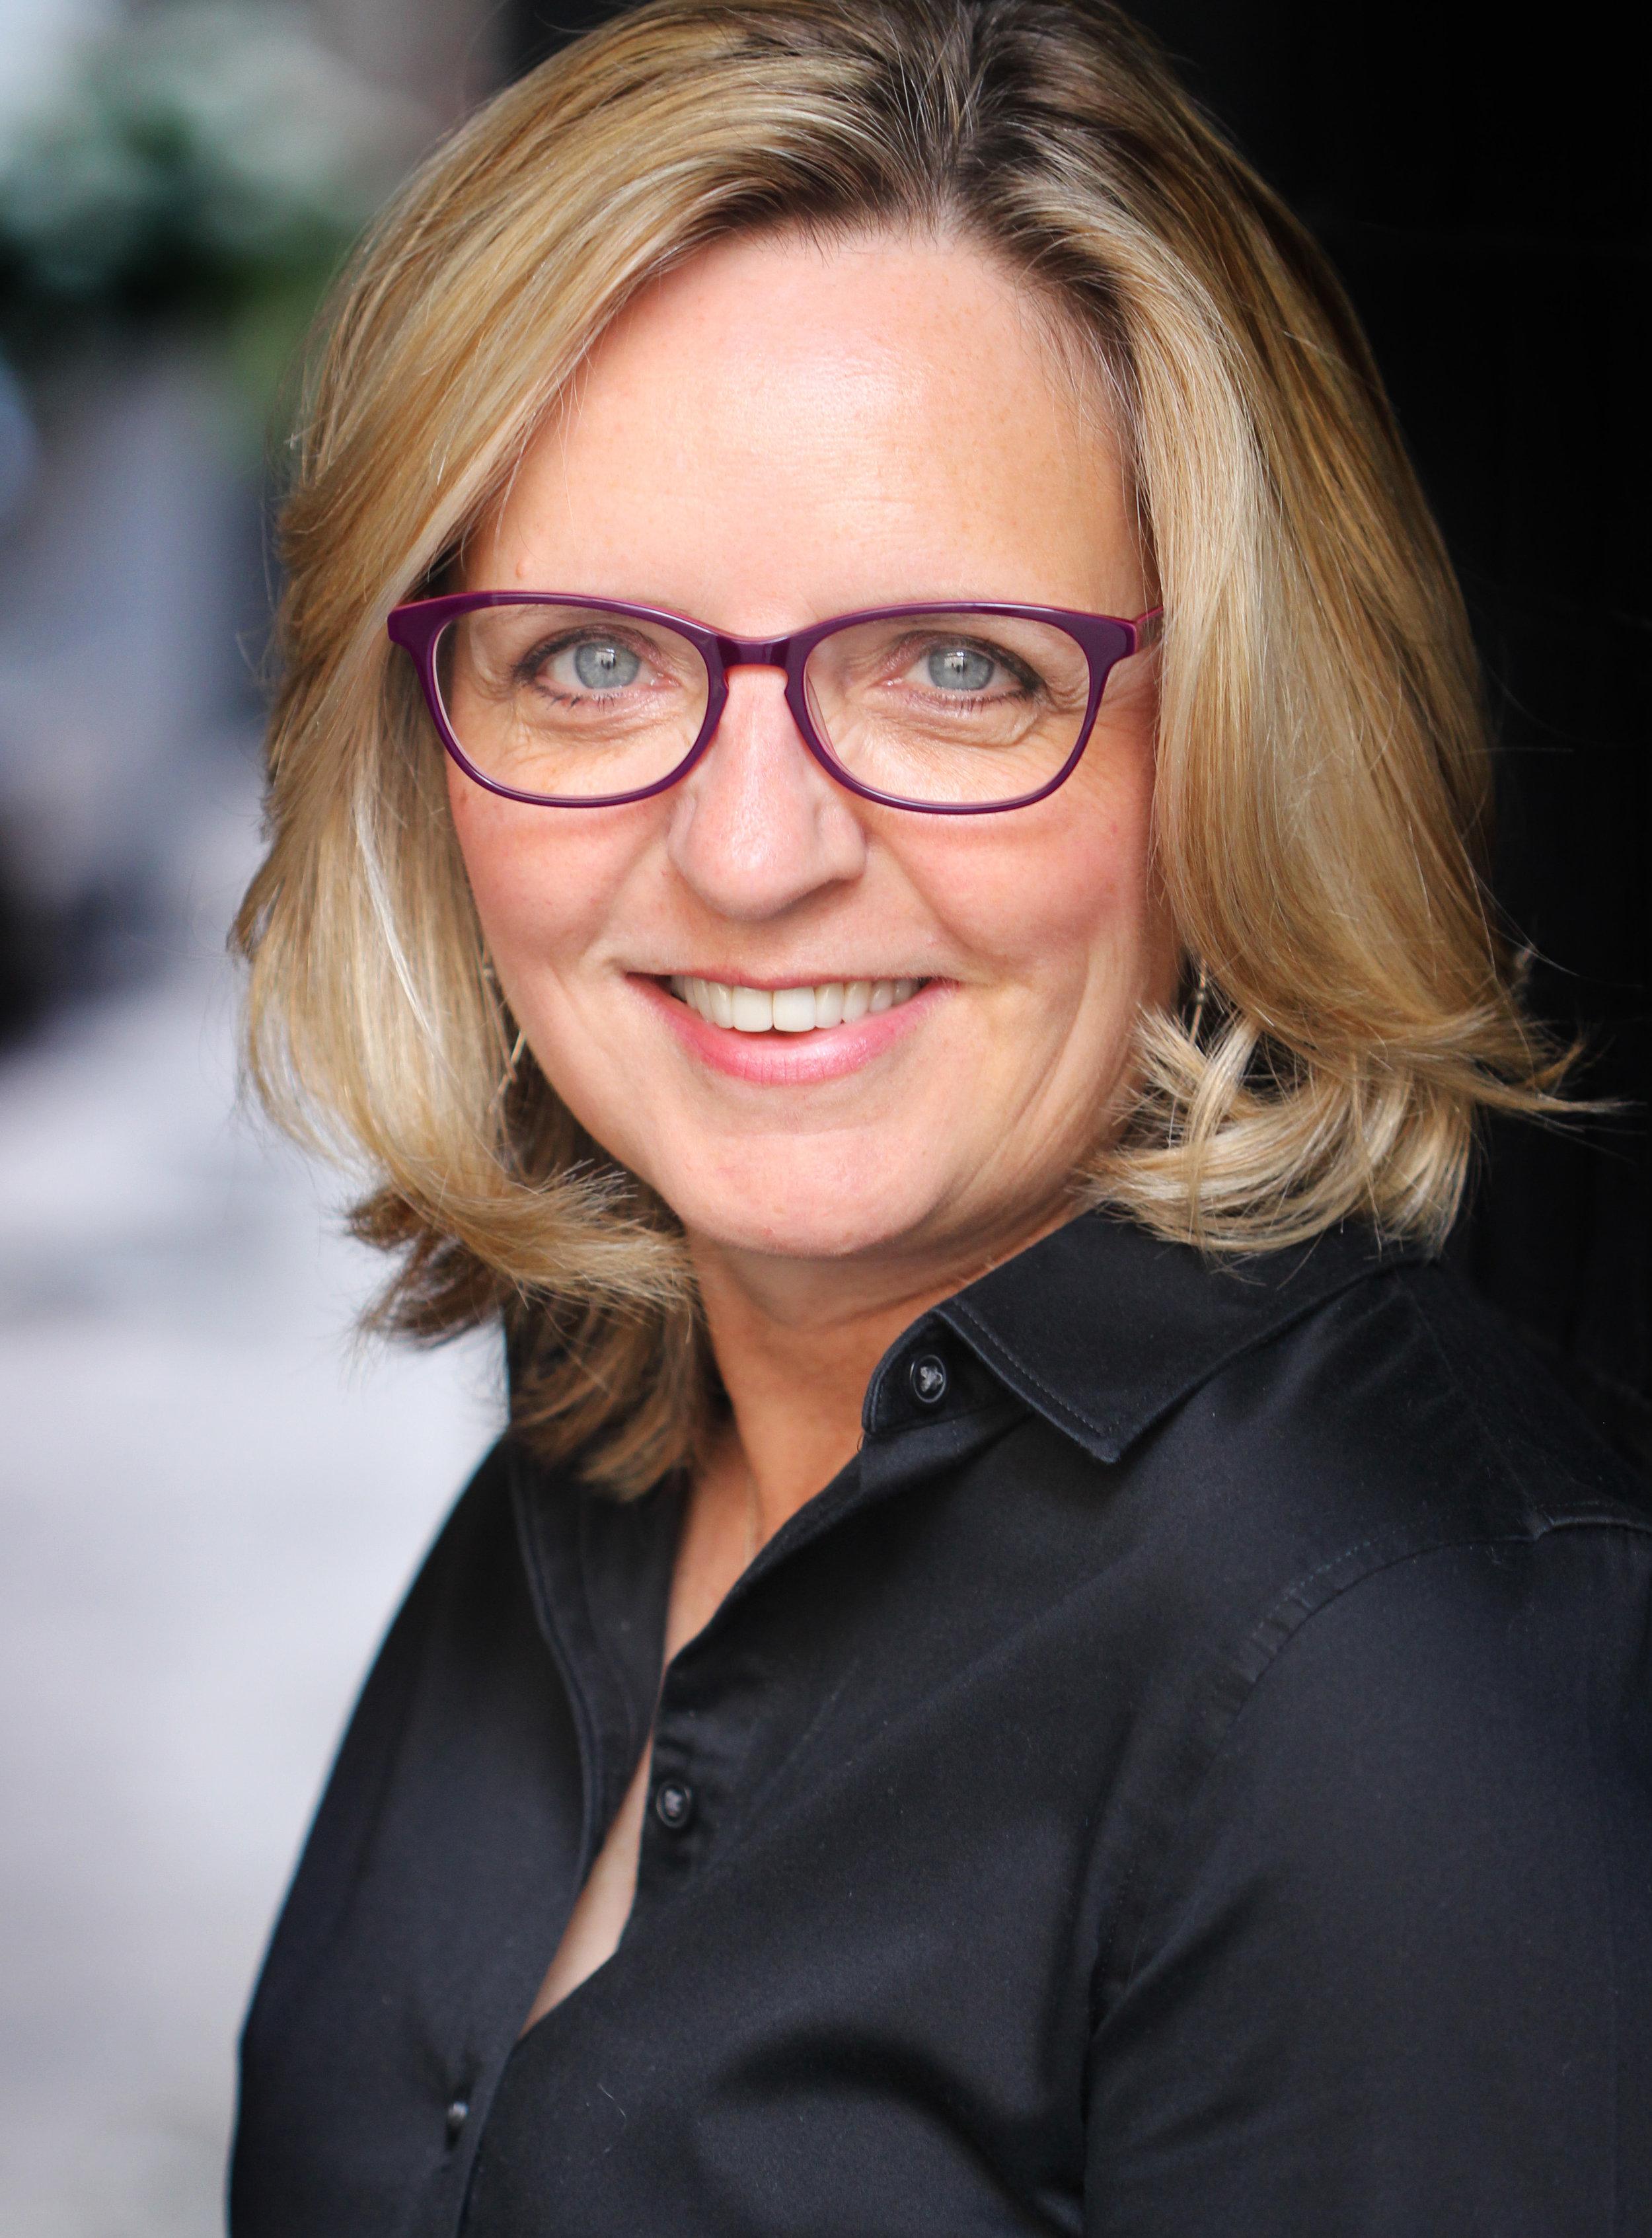 Samantha Bowerman, CMP Founder